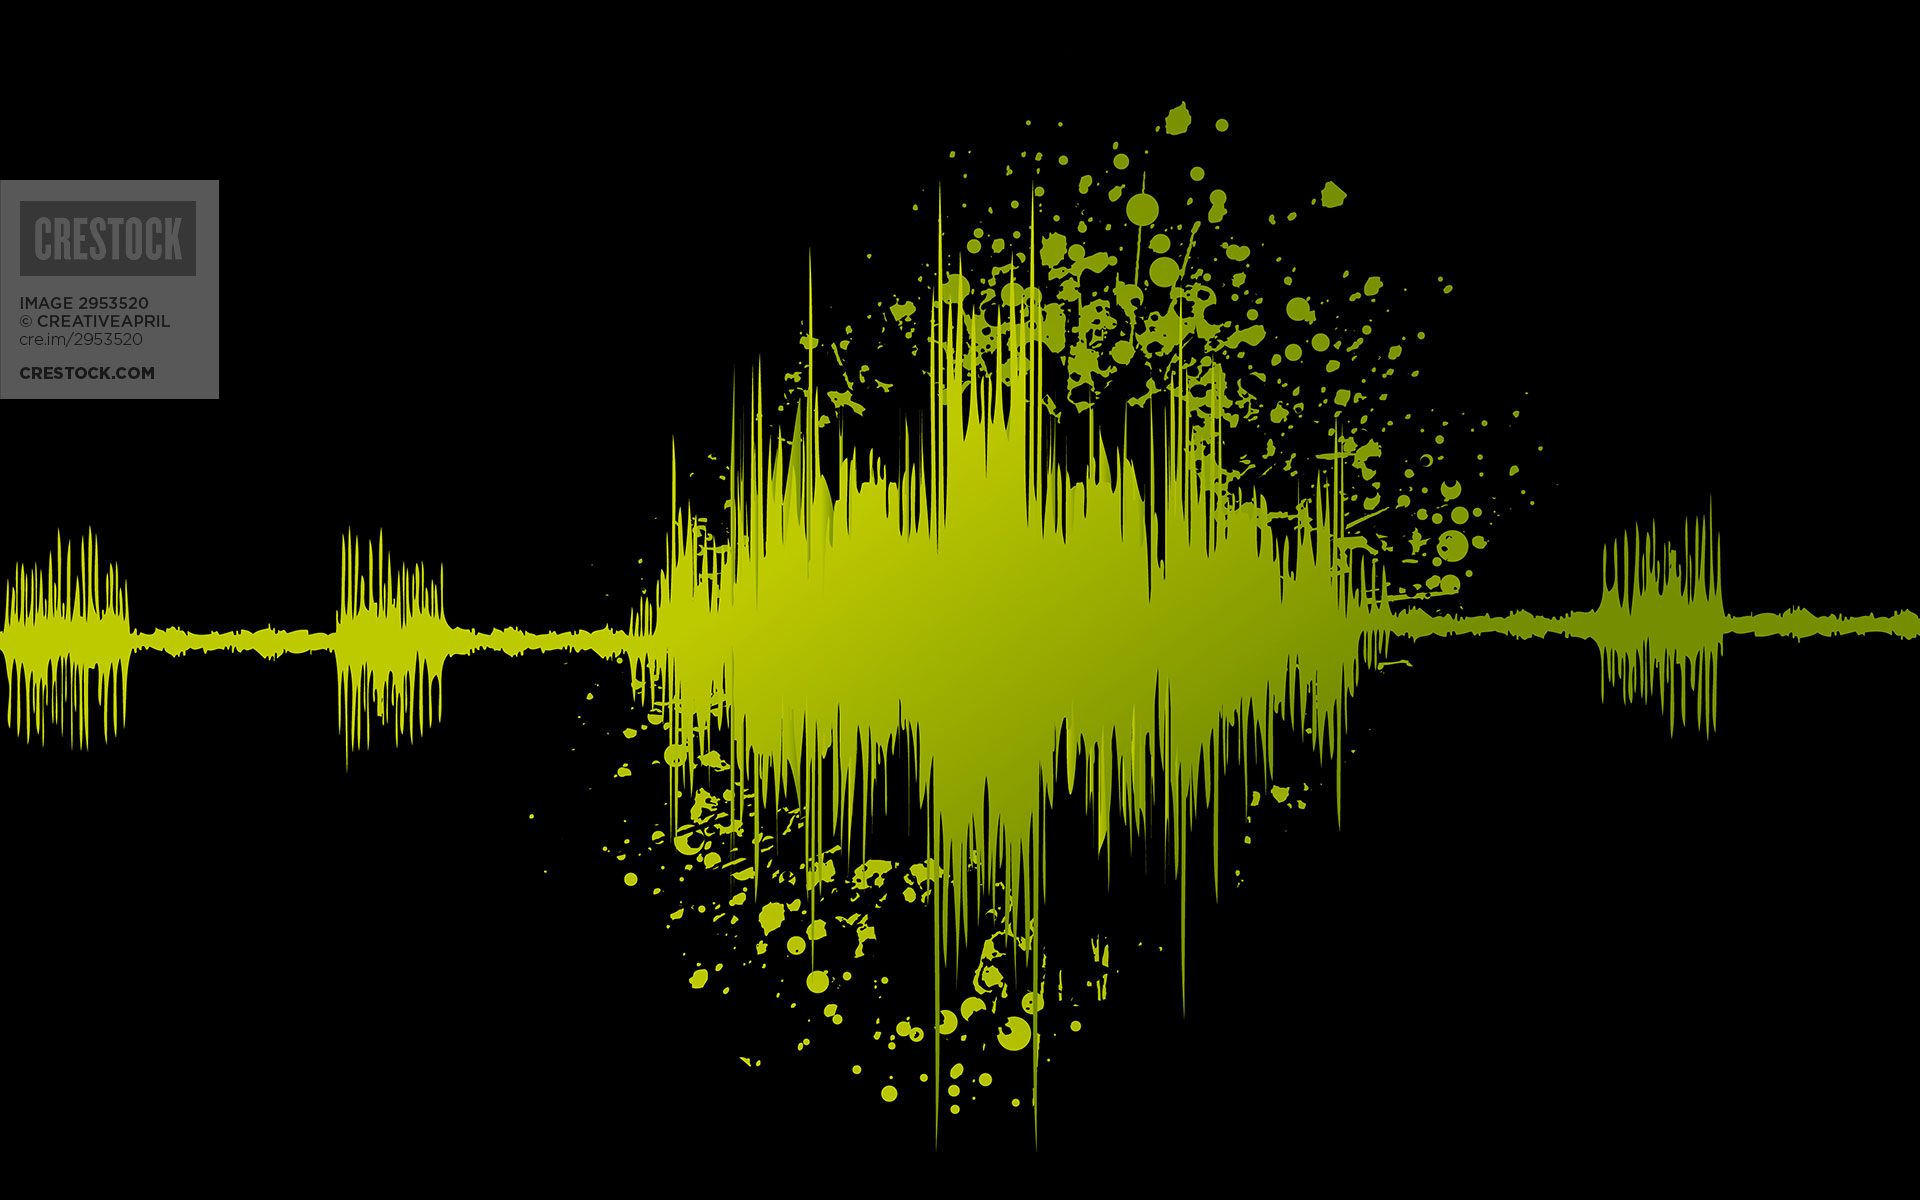 digital soundwaves wwwpixsharkcom images galleries